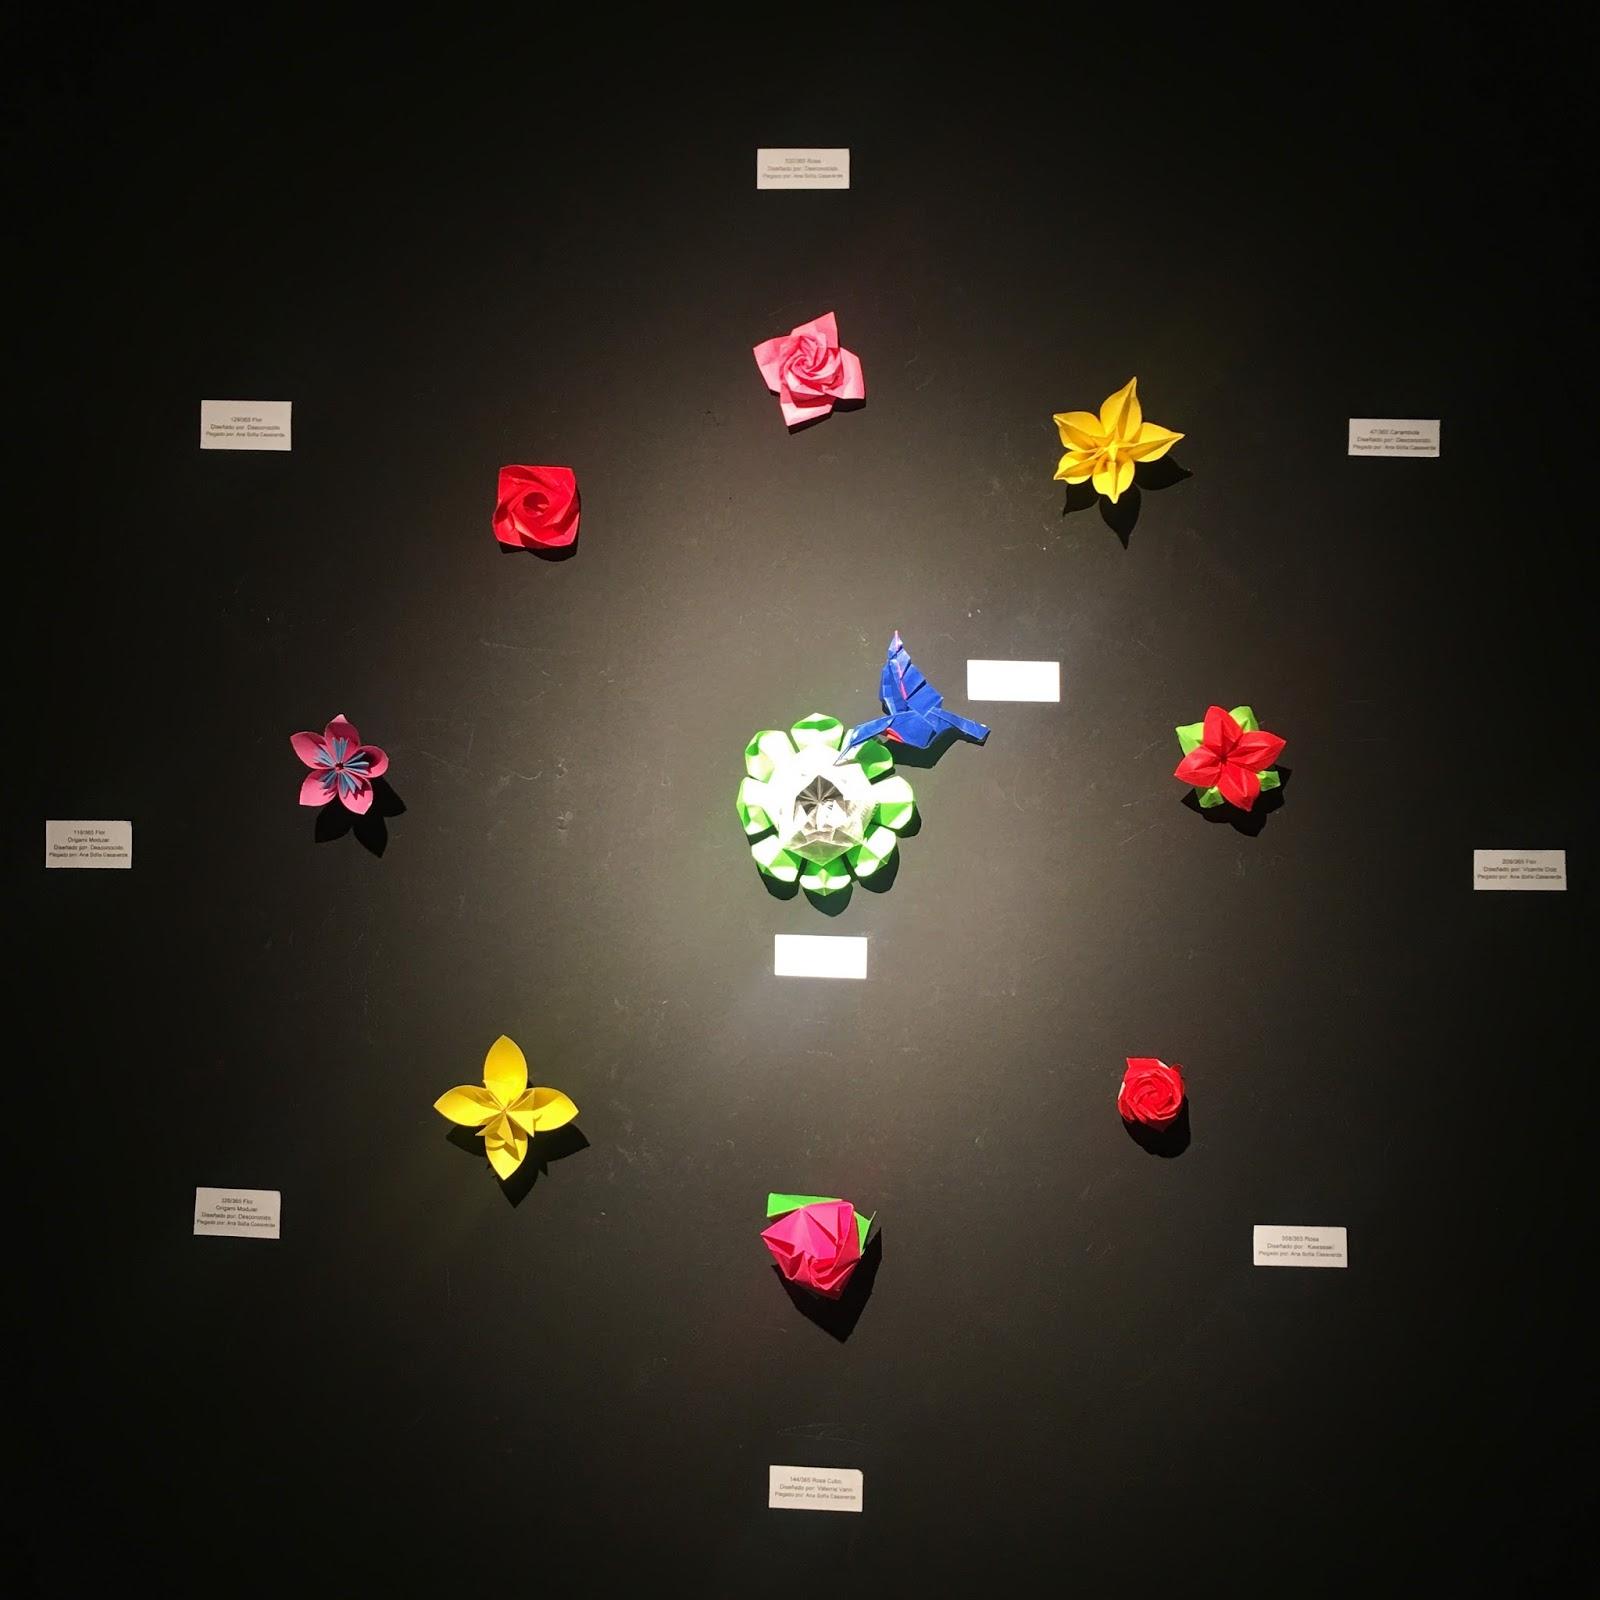 Flores de Papel - Ana Sofía Casaverde